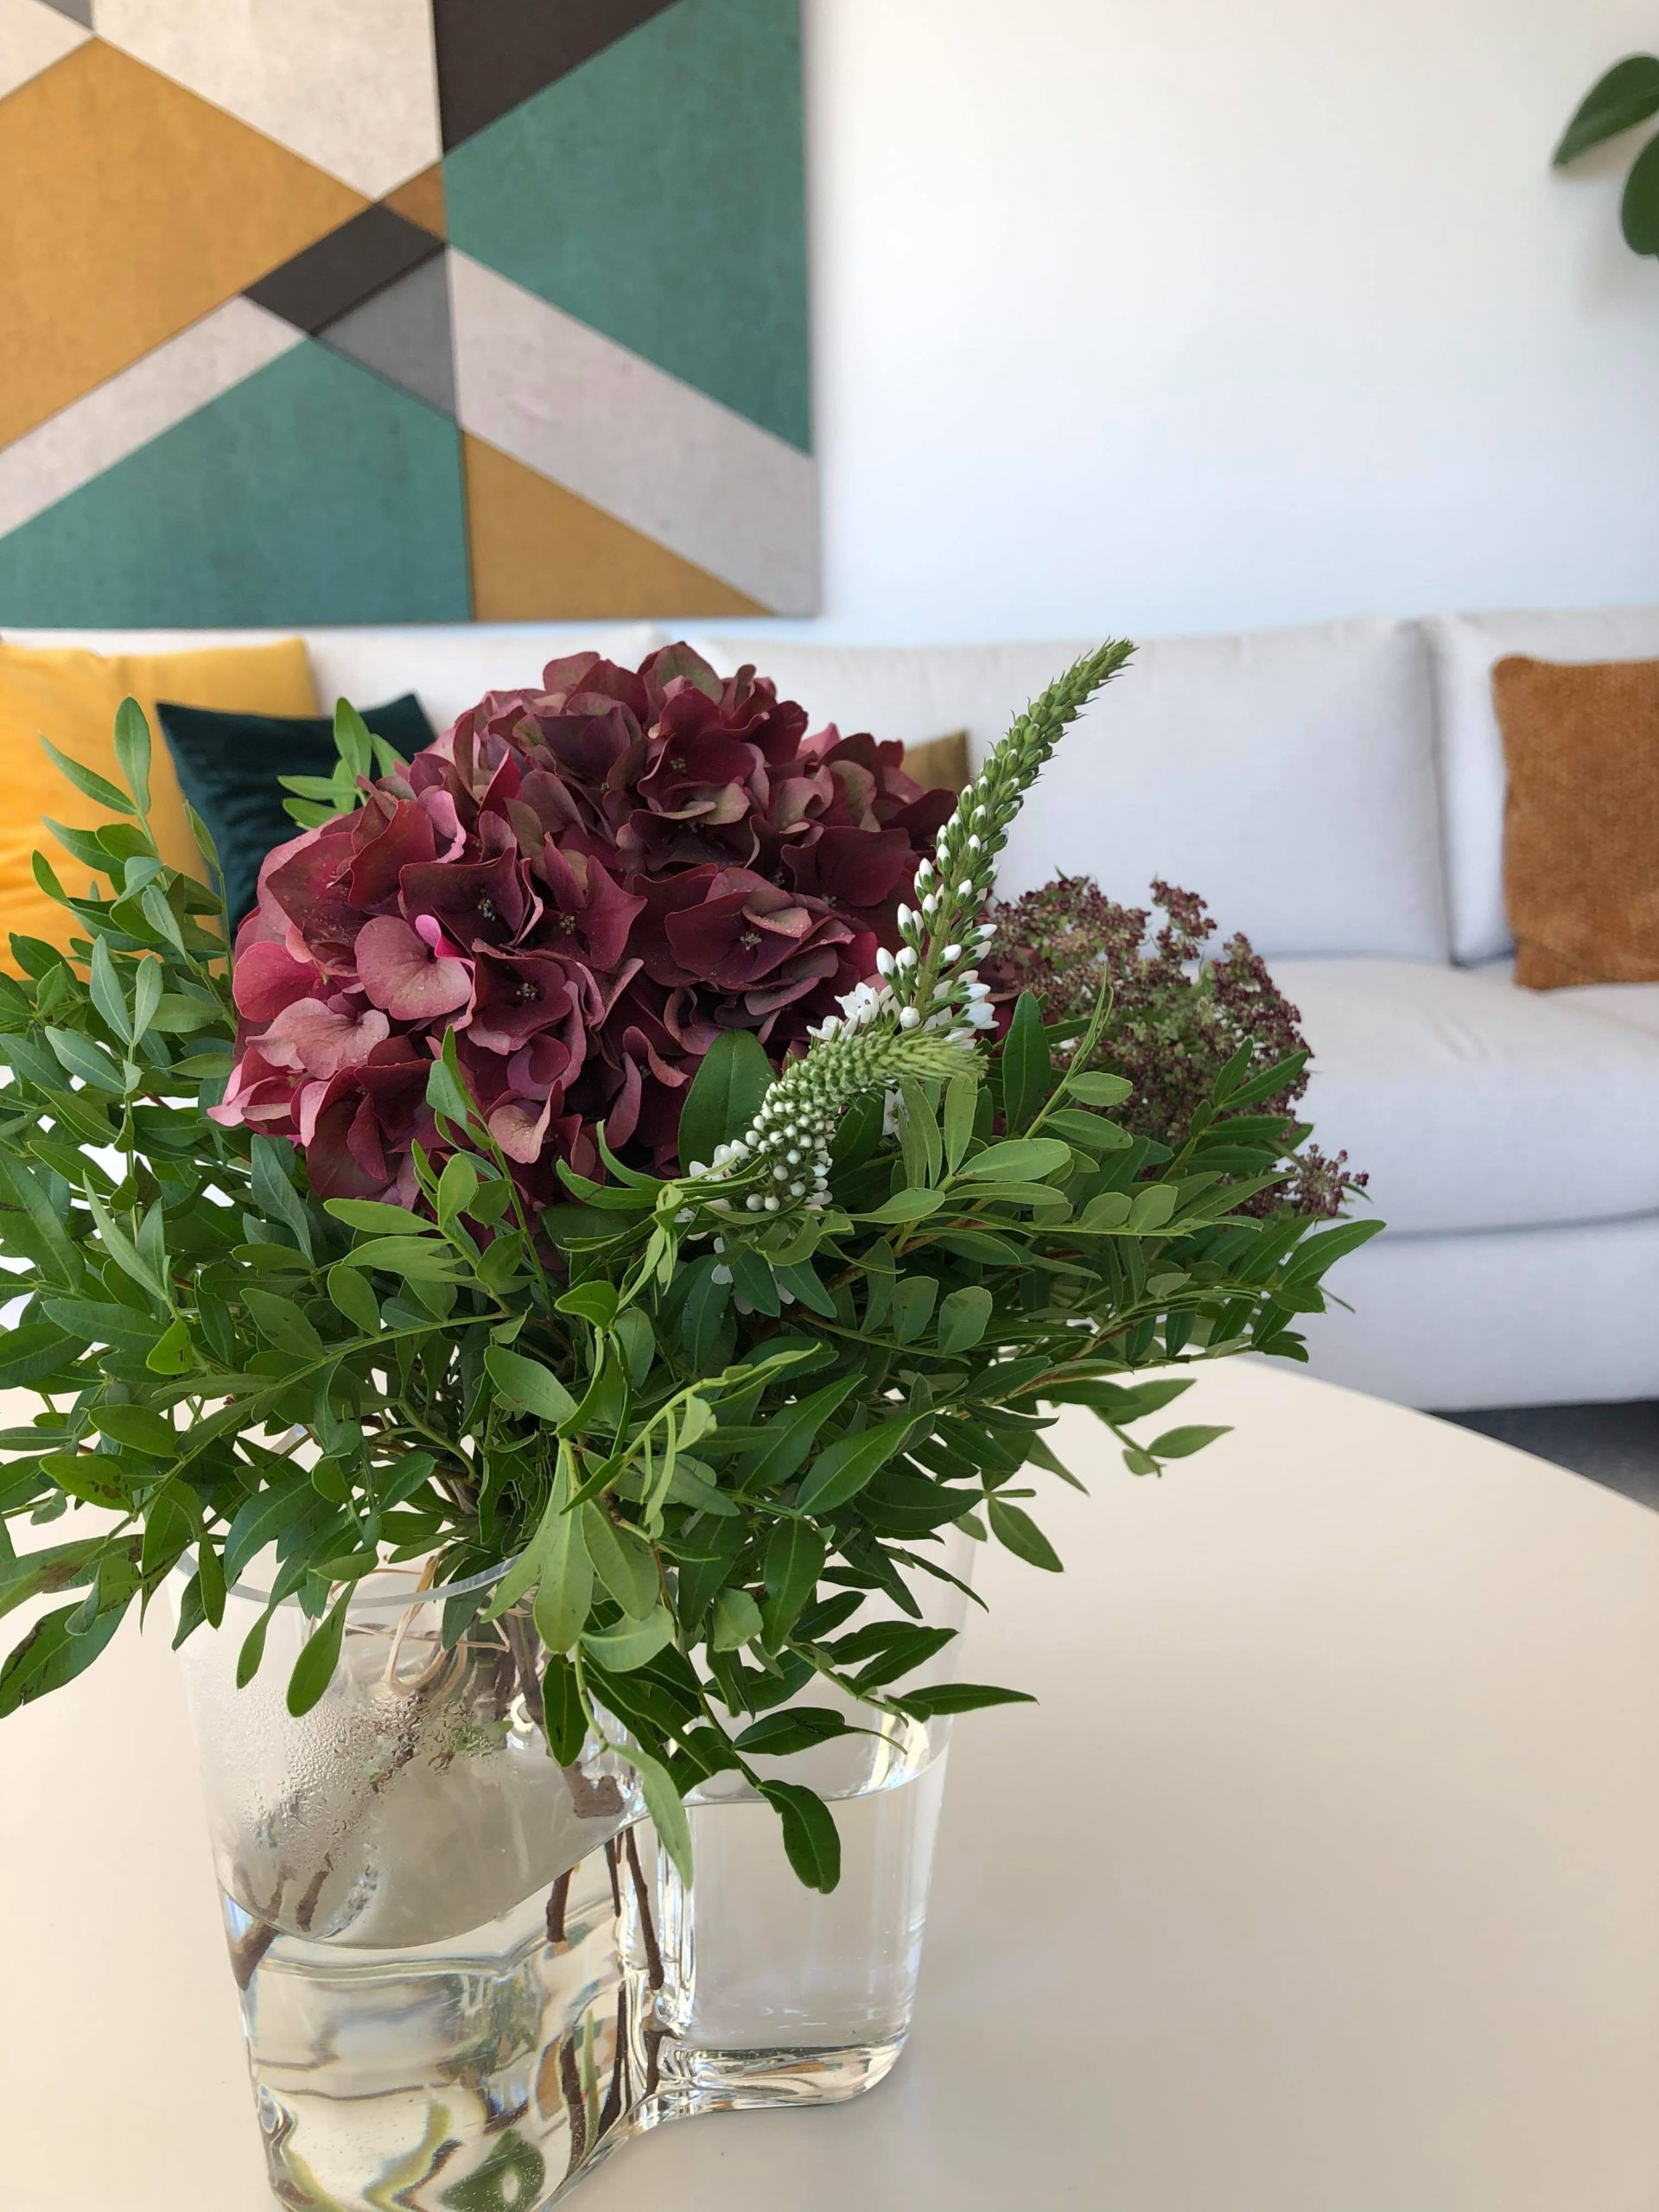 Viikonloppukimppu hortensiasta